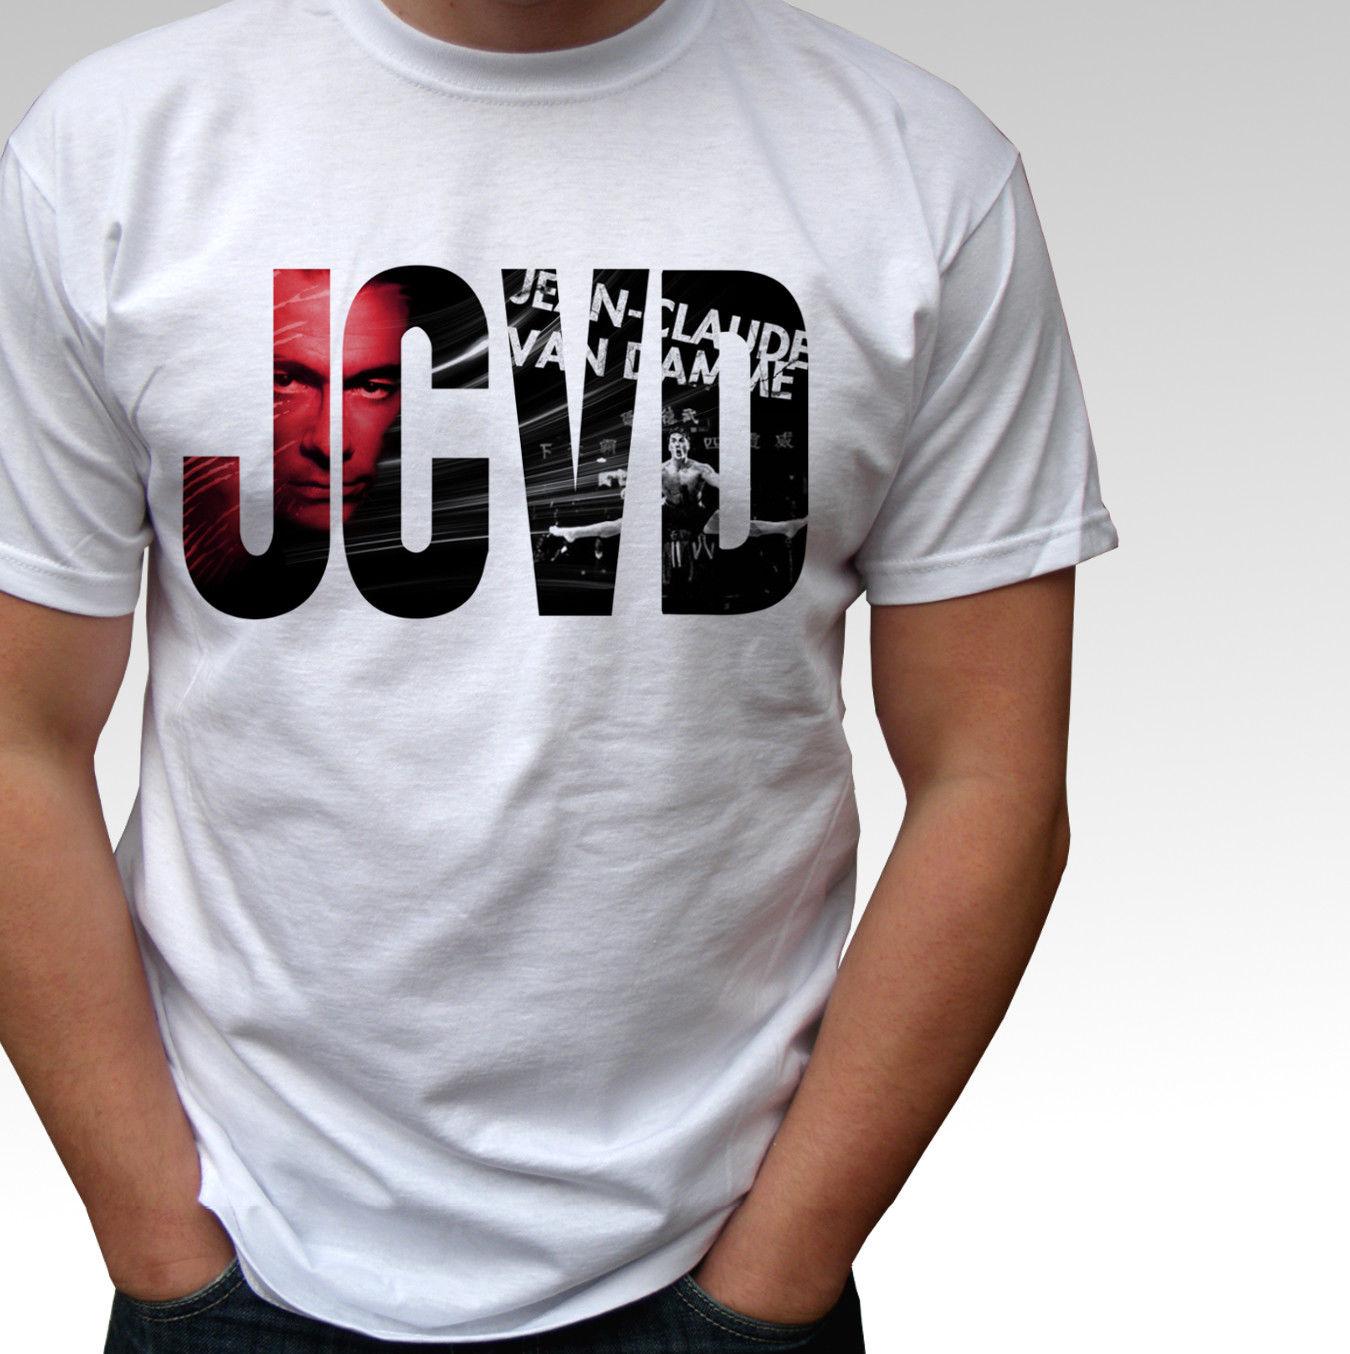 JCVD logo Jean Claude Van Damme white t shirt top - mens and kids sizes Men 2018 Summer Round Neck MenS T Shirt